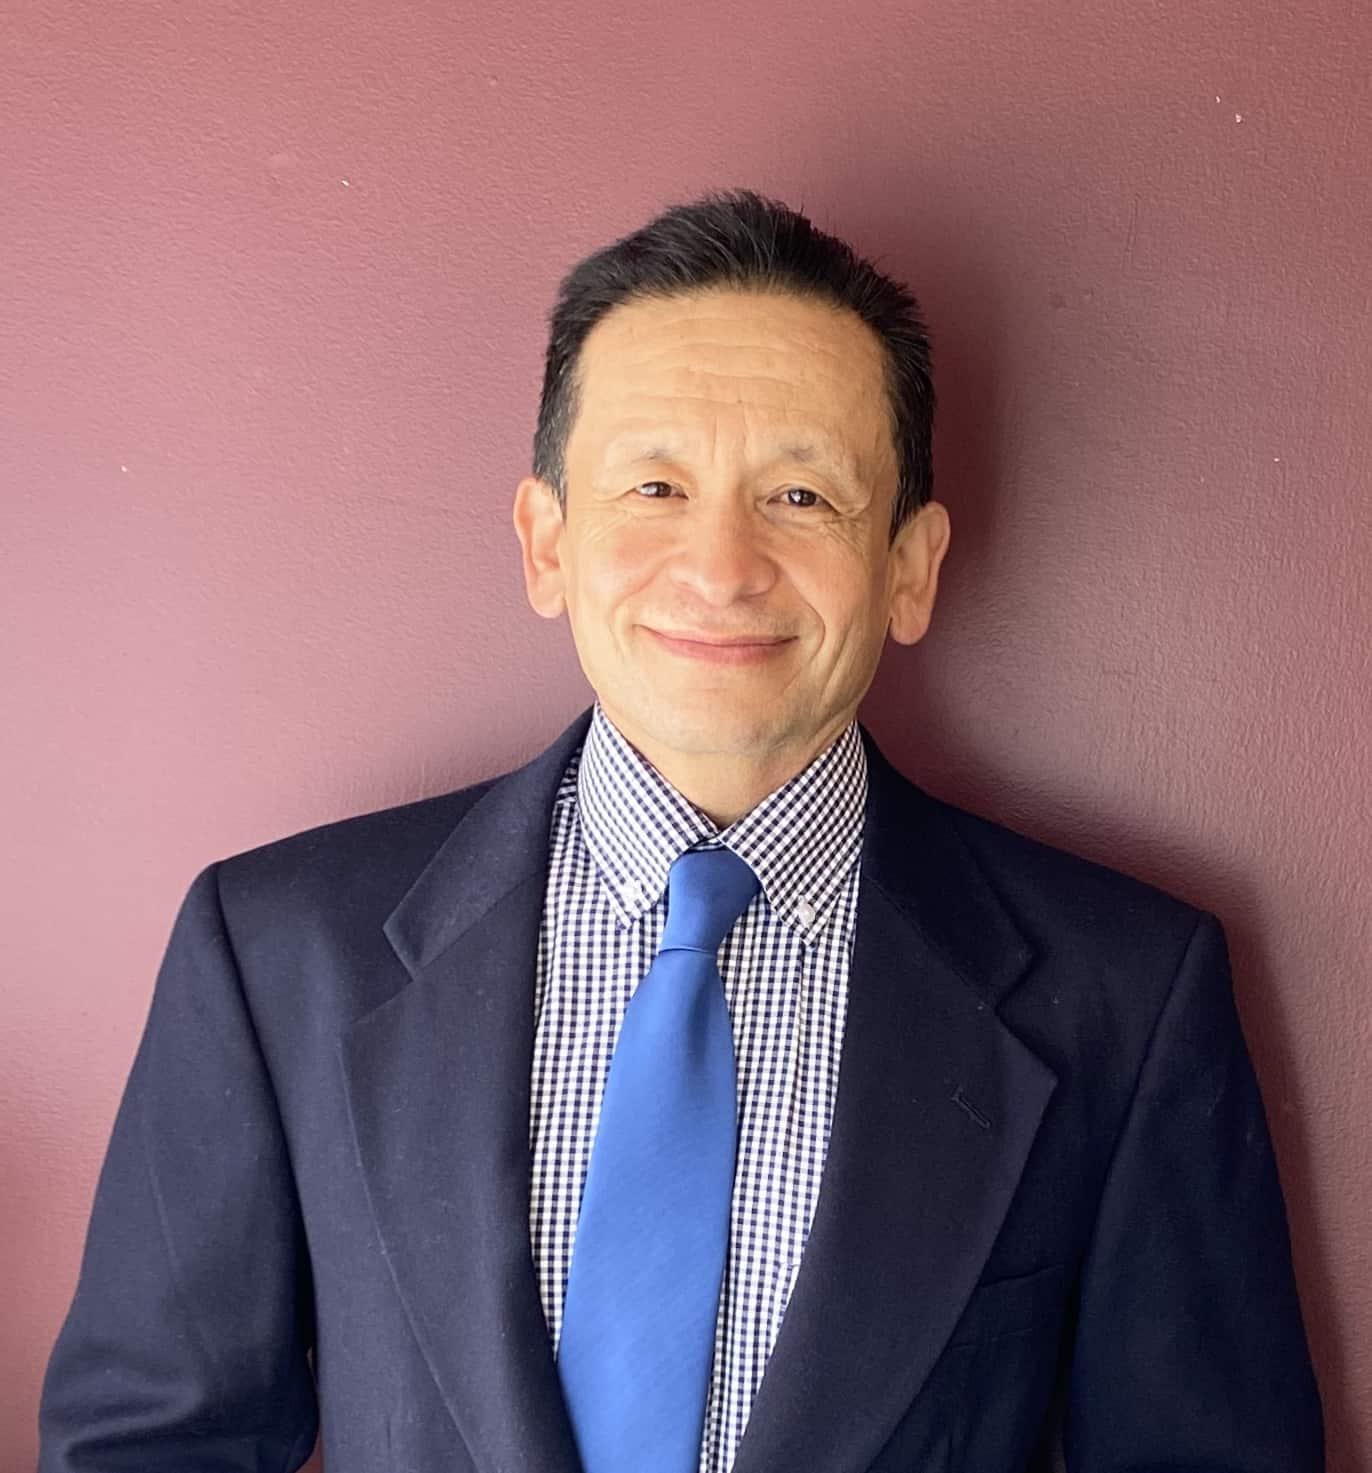 Ricardo Hernandez-Pinzon